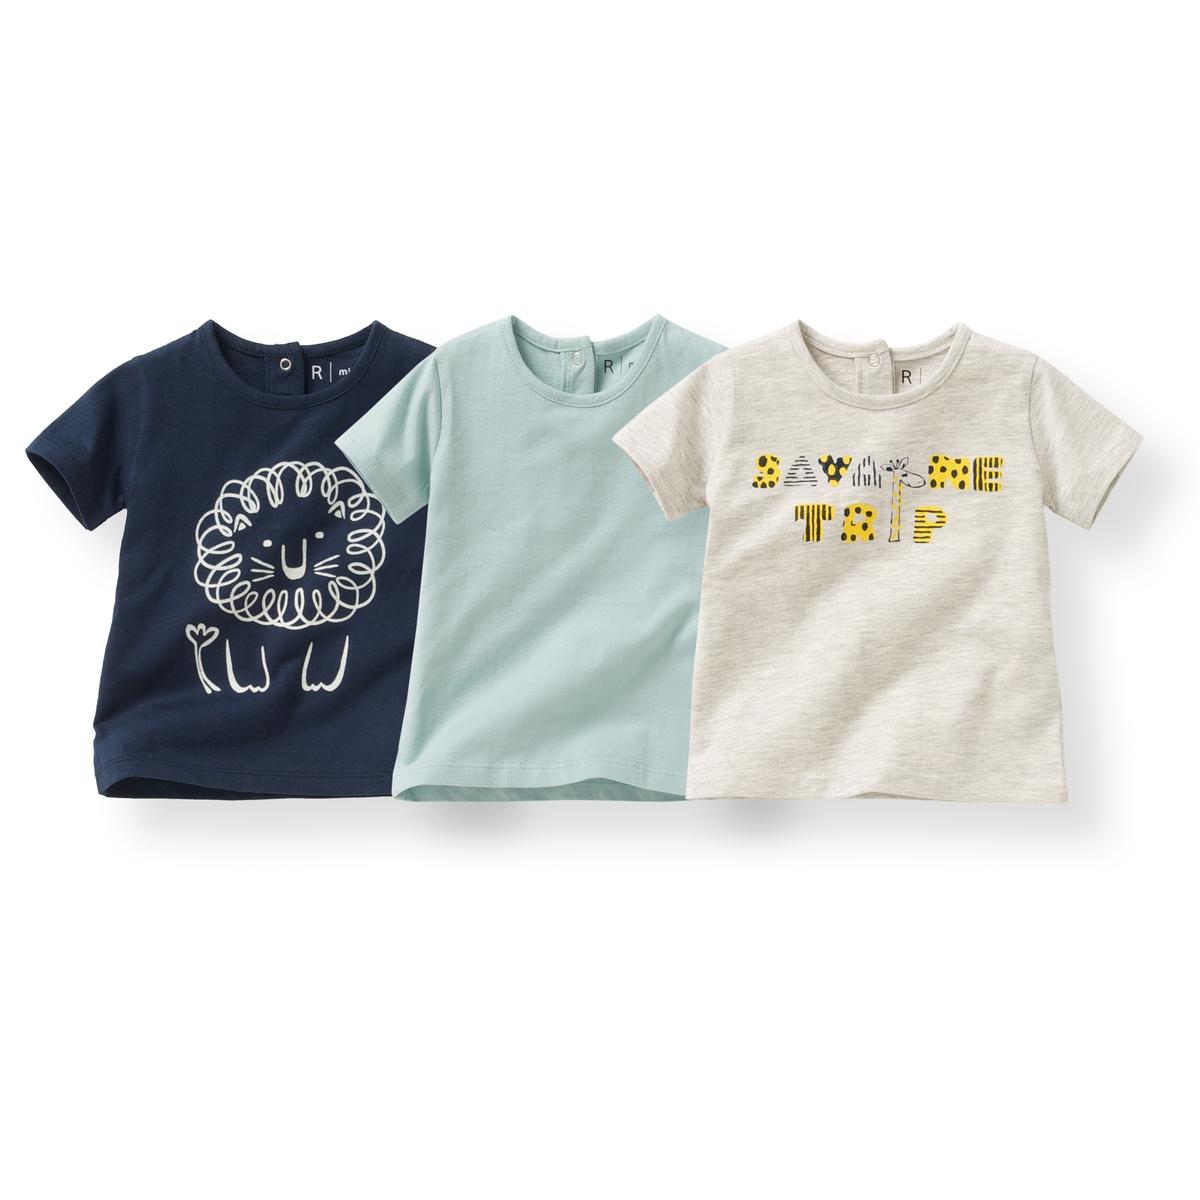 3 футболки с короткими рукавами 1 мес-3 лет от La Redoute